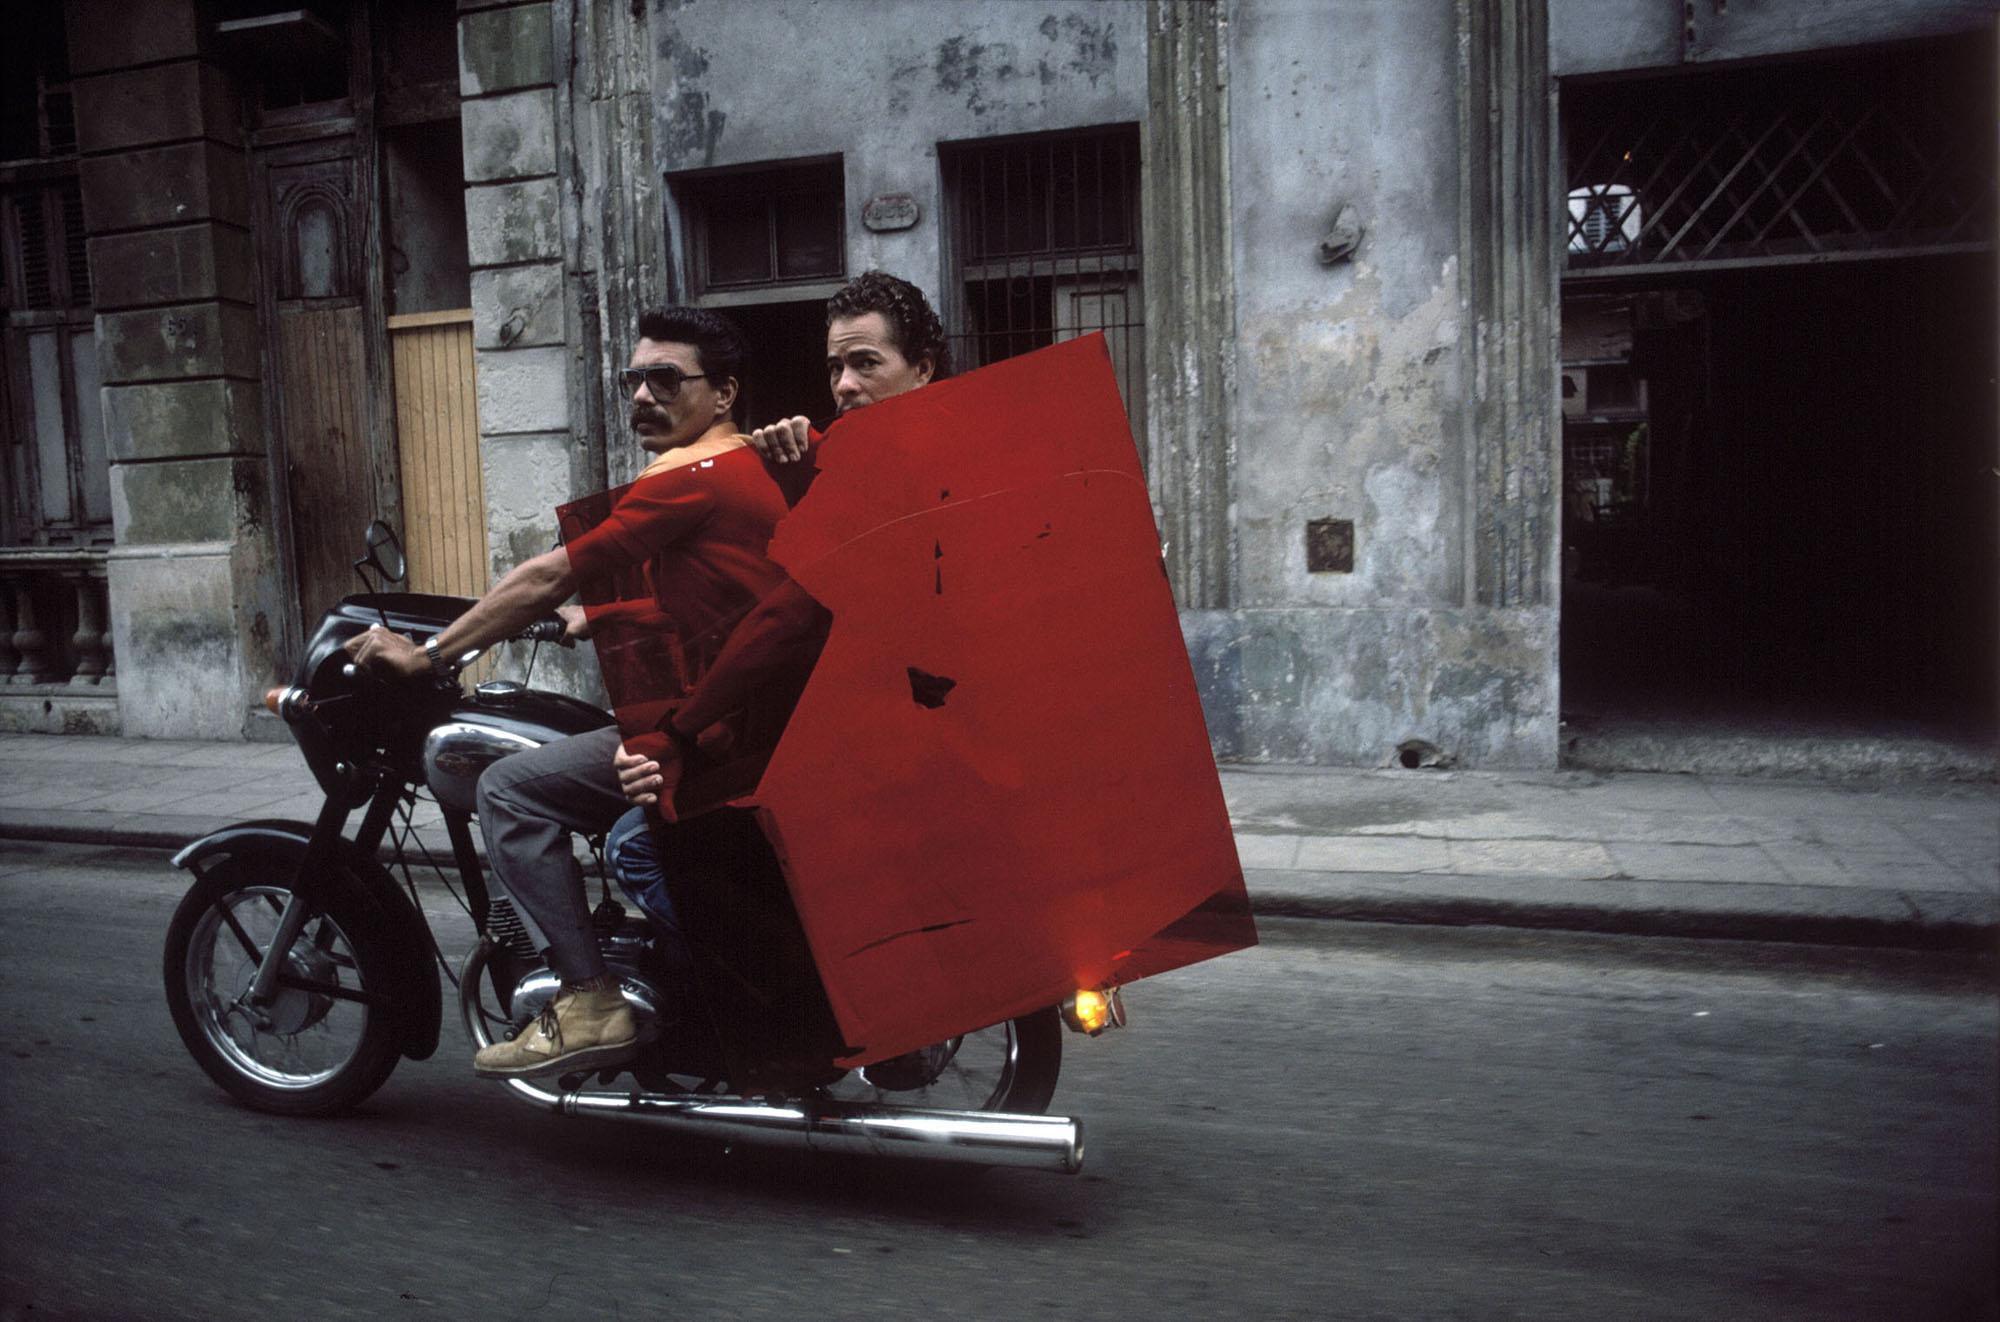 Rene_Burri__Havanna__Cuba__1987_copyright_ Rene Burri _Magnum Photos